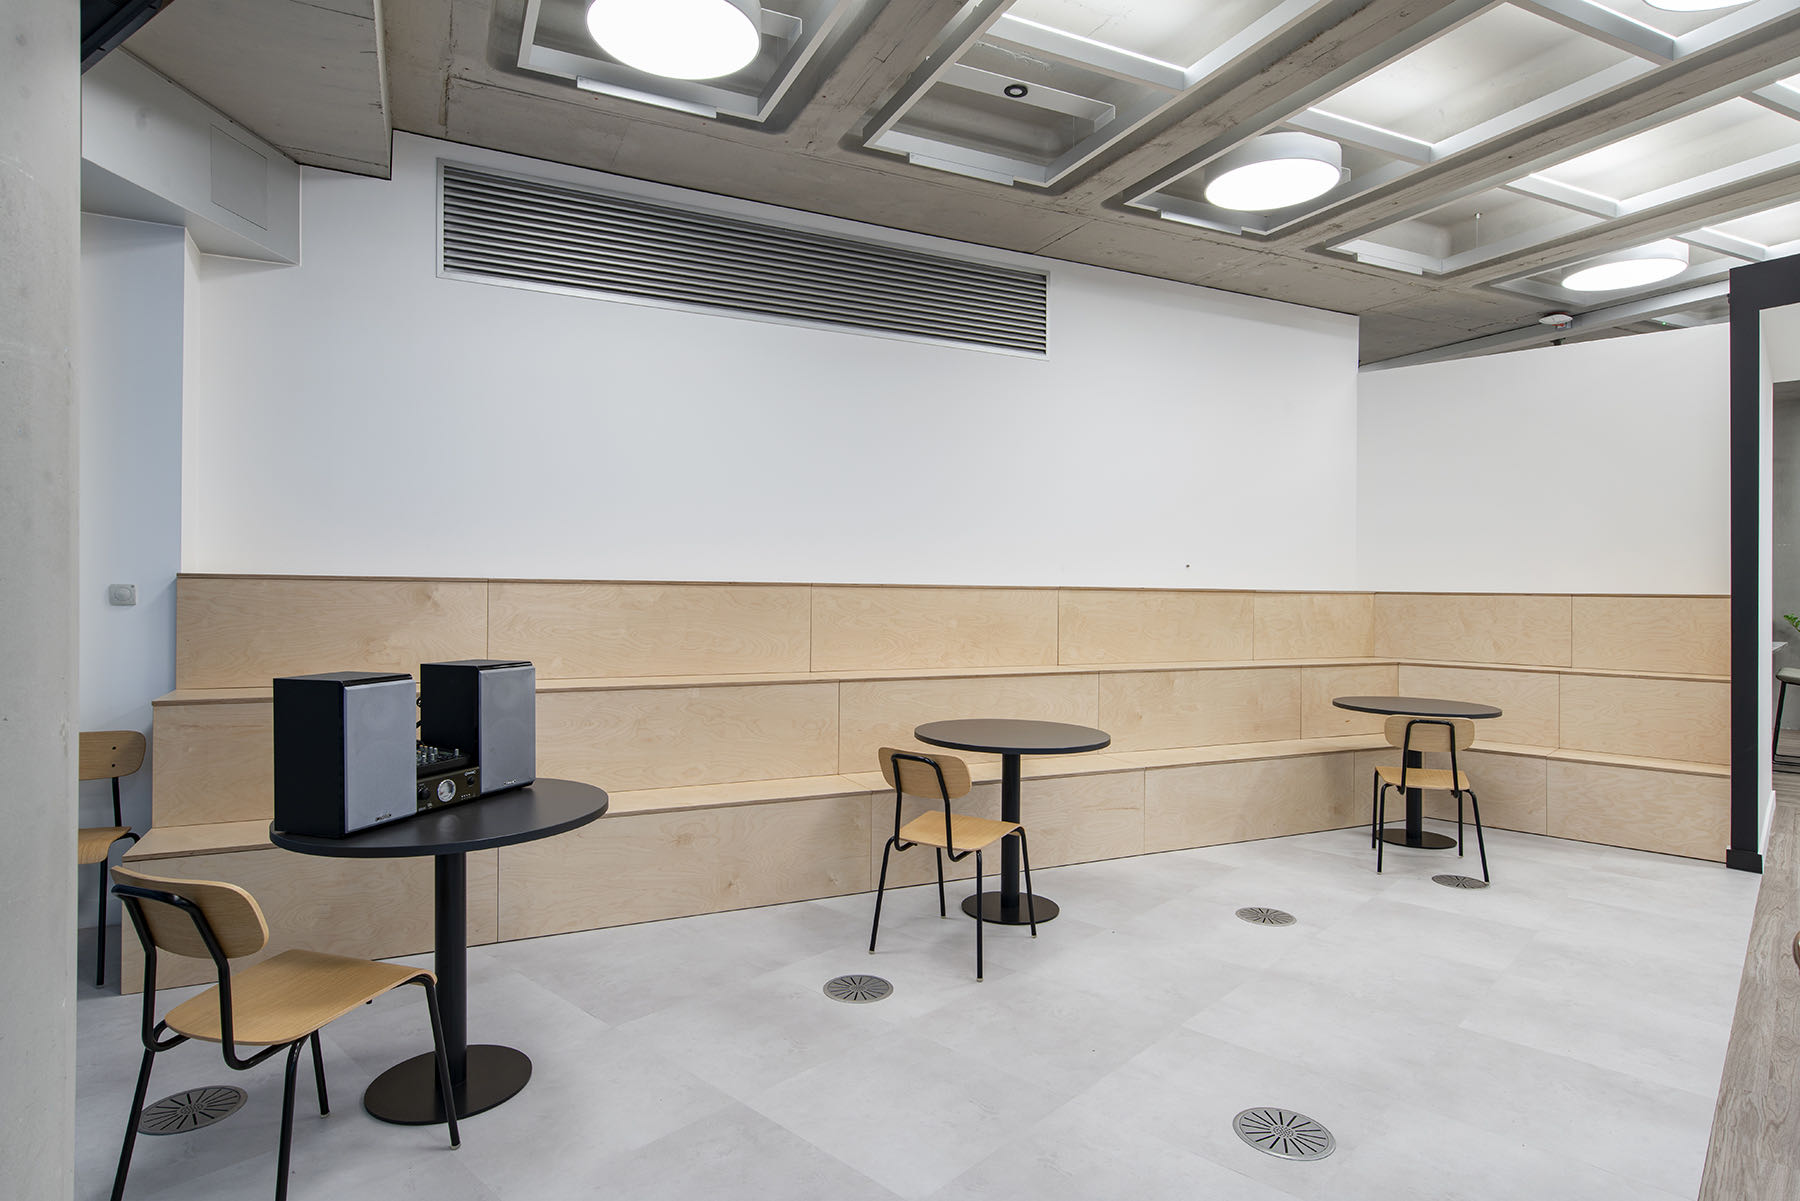 metapack-london-office-12